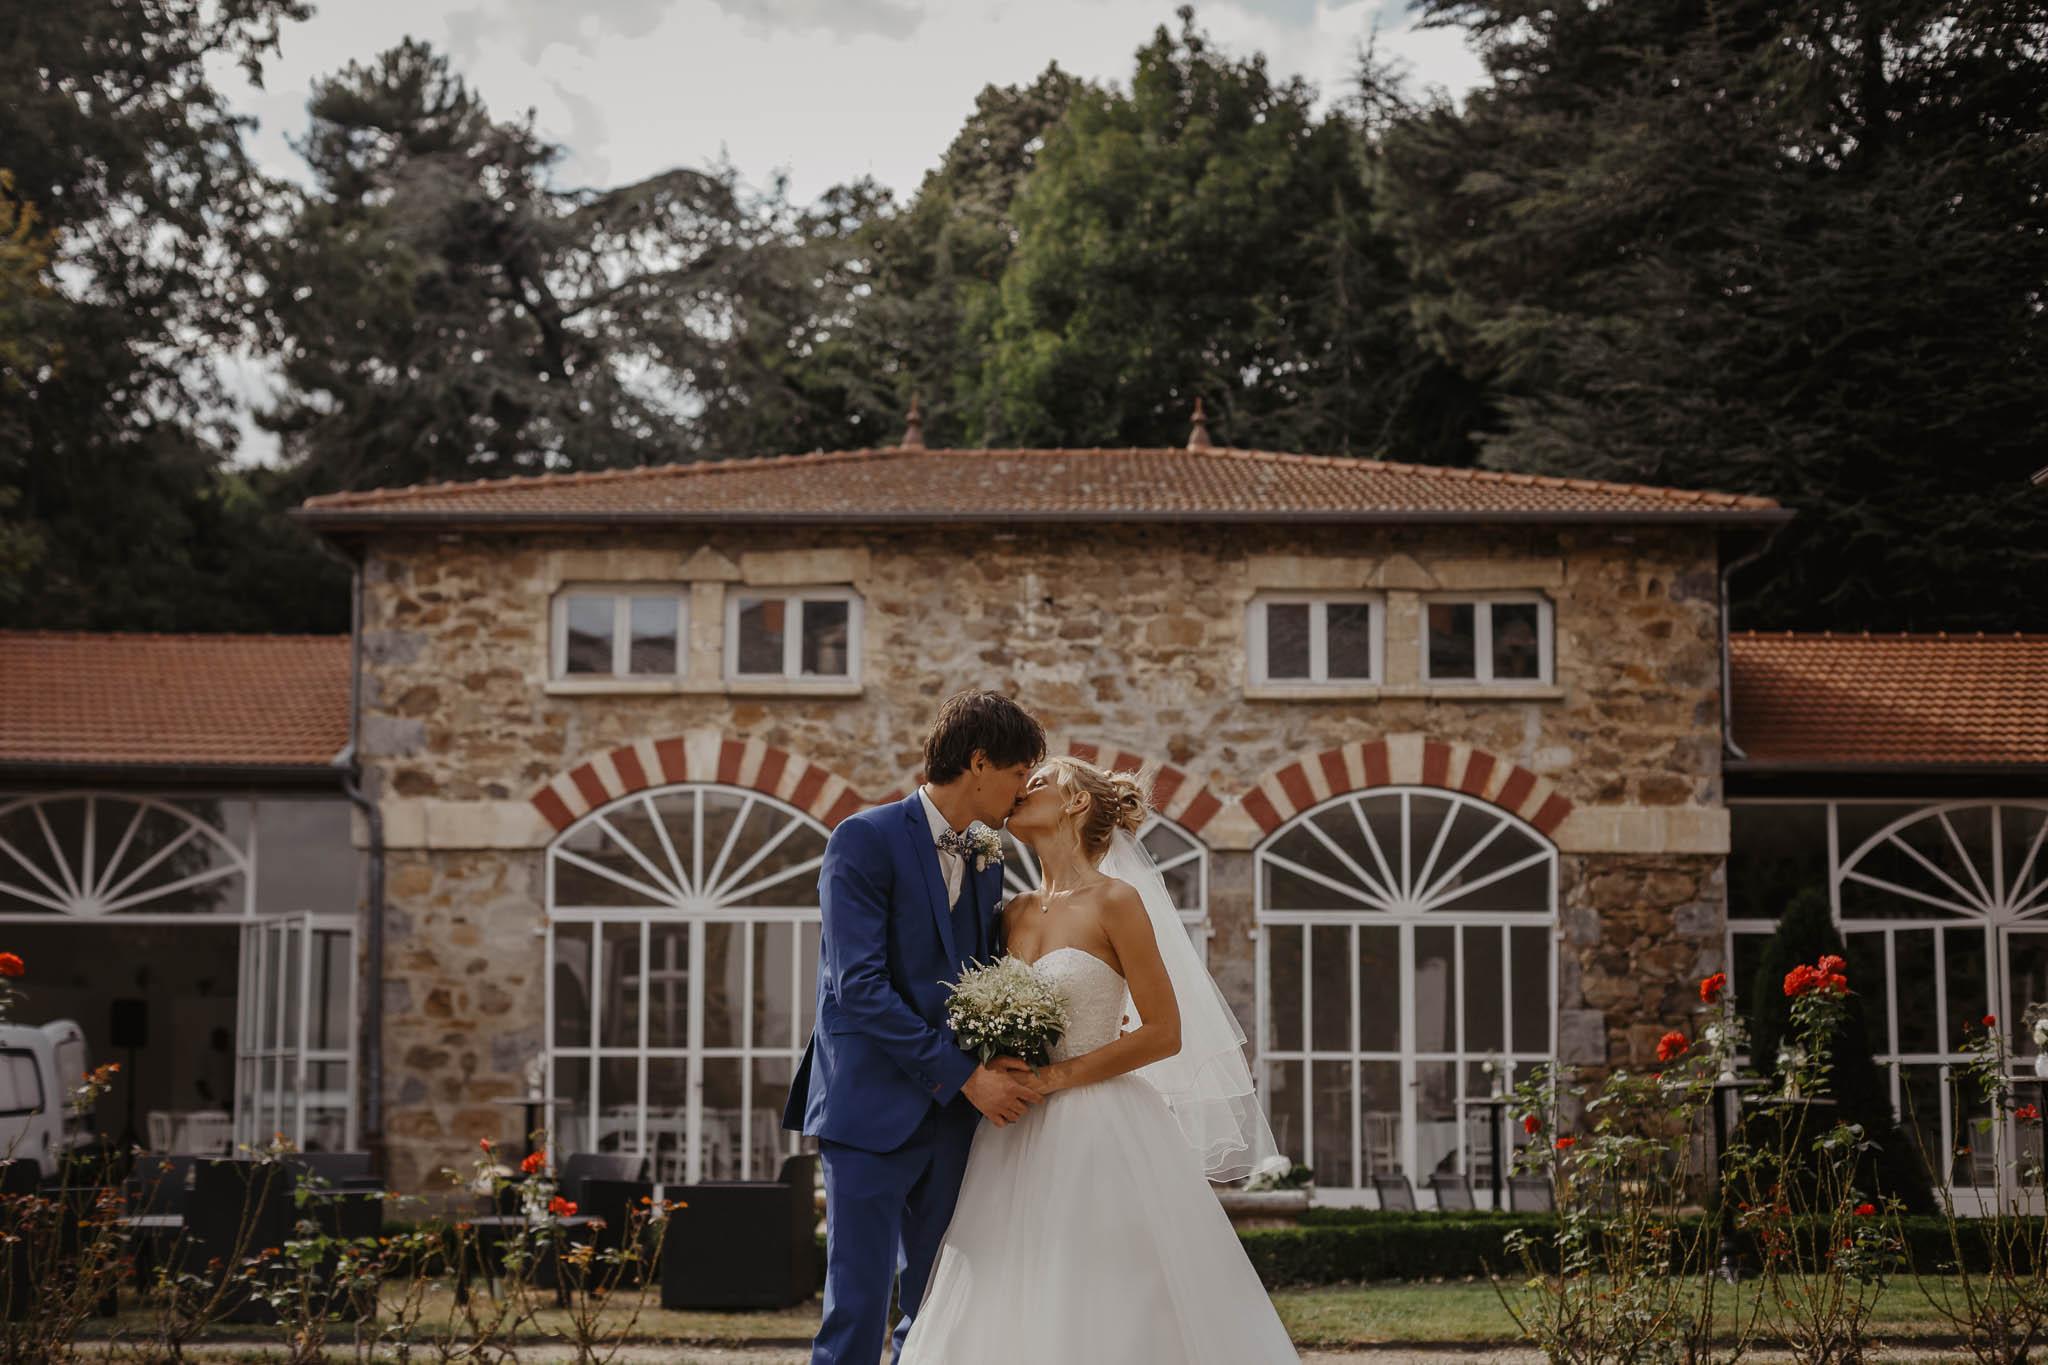 mariage-chateau-gaudras-ingold-61.jpg